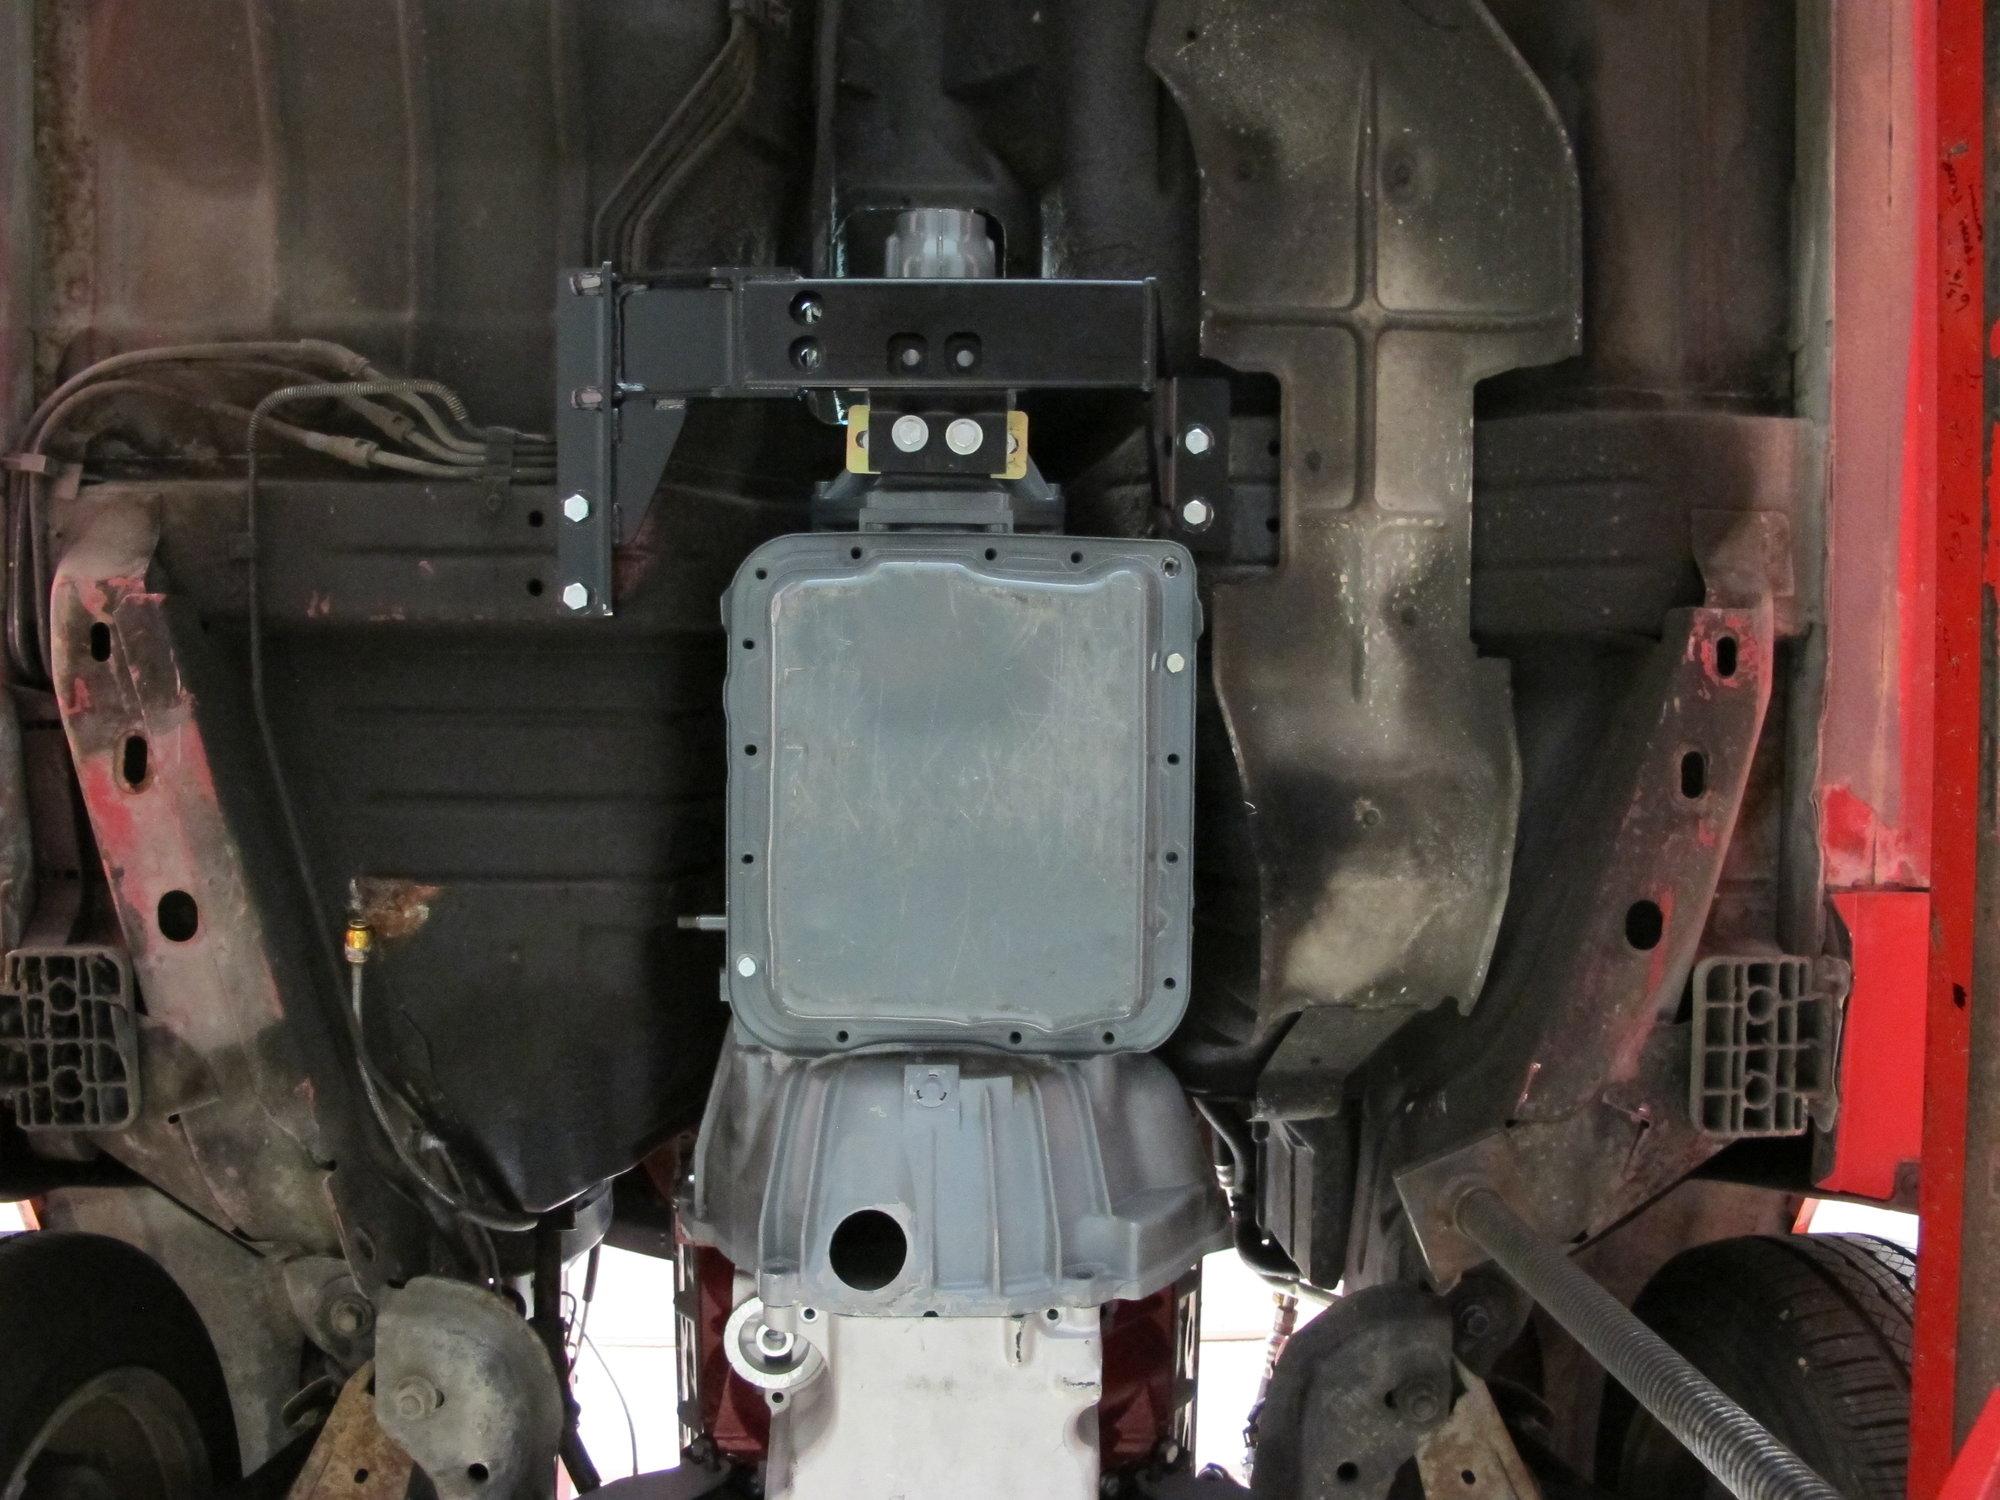 1999 2000 01 02 03 Chevrolet GMC Truck Yukon 4x4 Transmission Cross Member Brace